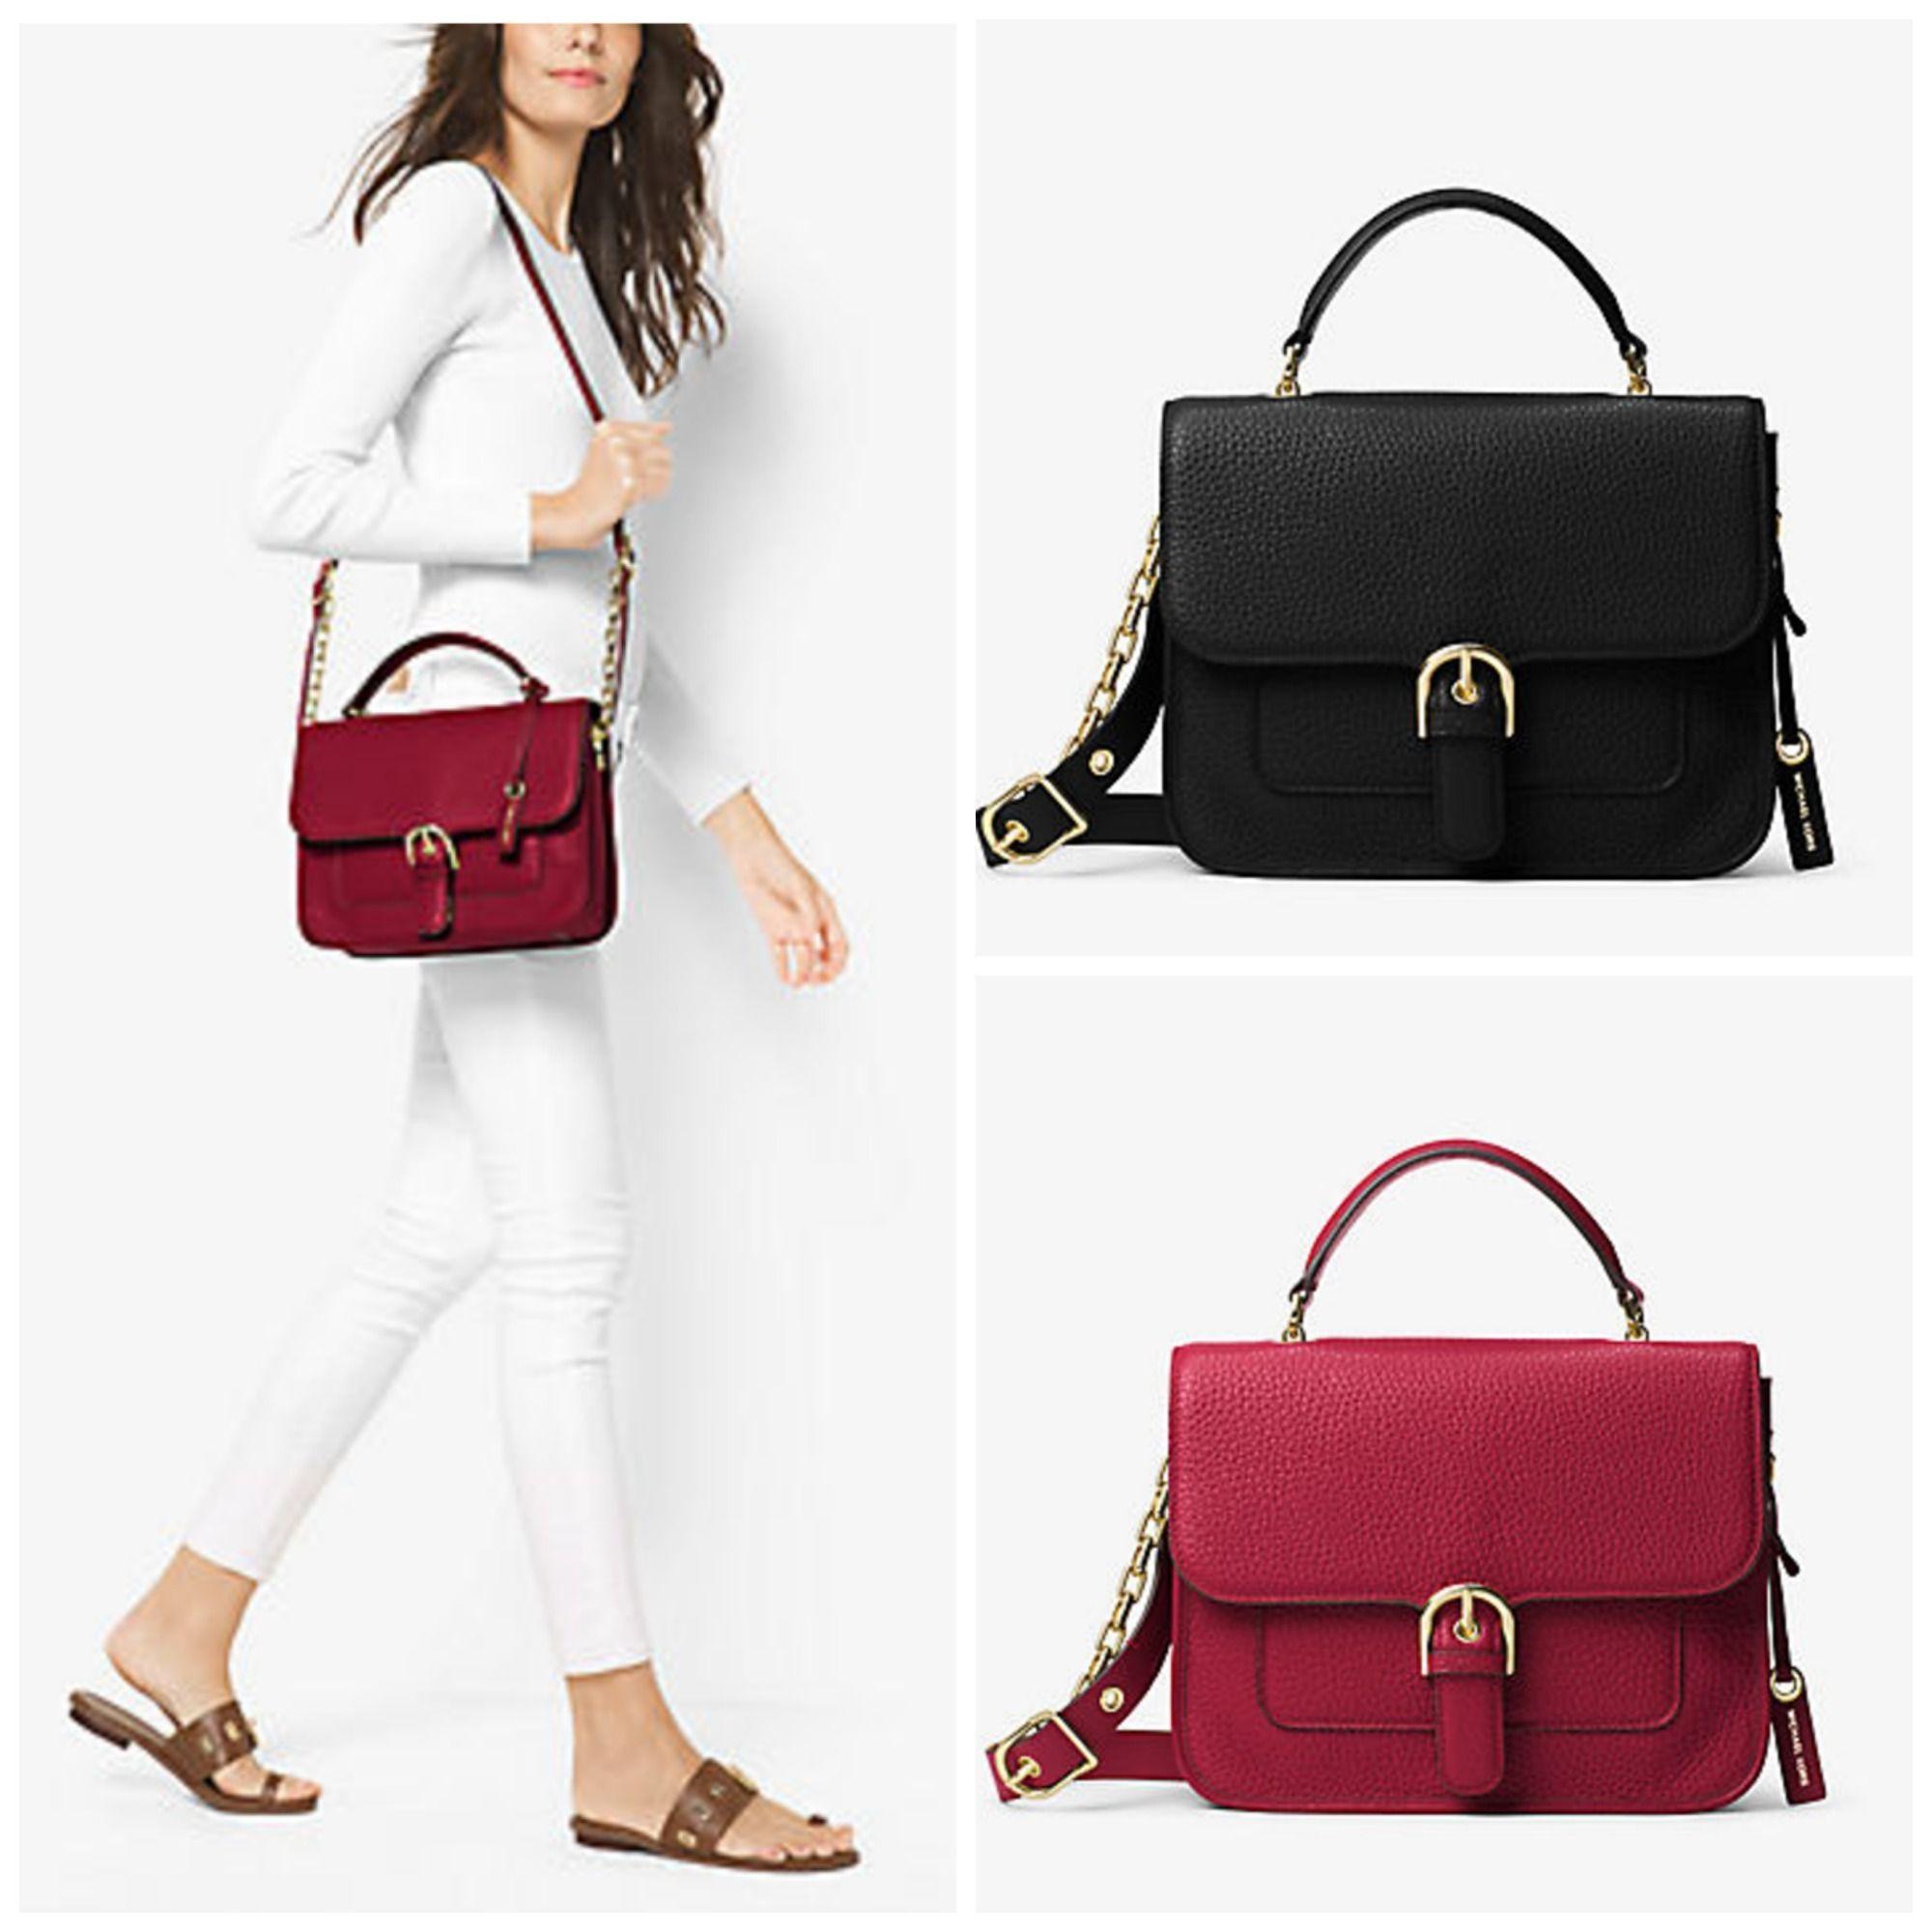 2fde027dd90584 MK Cooper Large Leather Top Handle Satchel Bag   Fashion   Bags ...